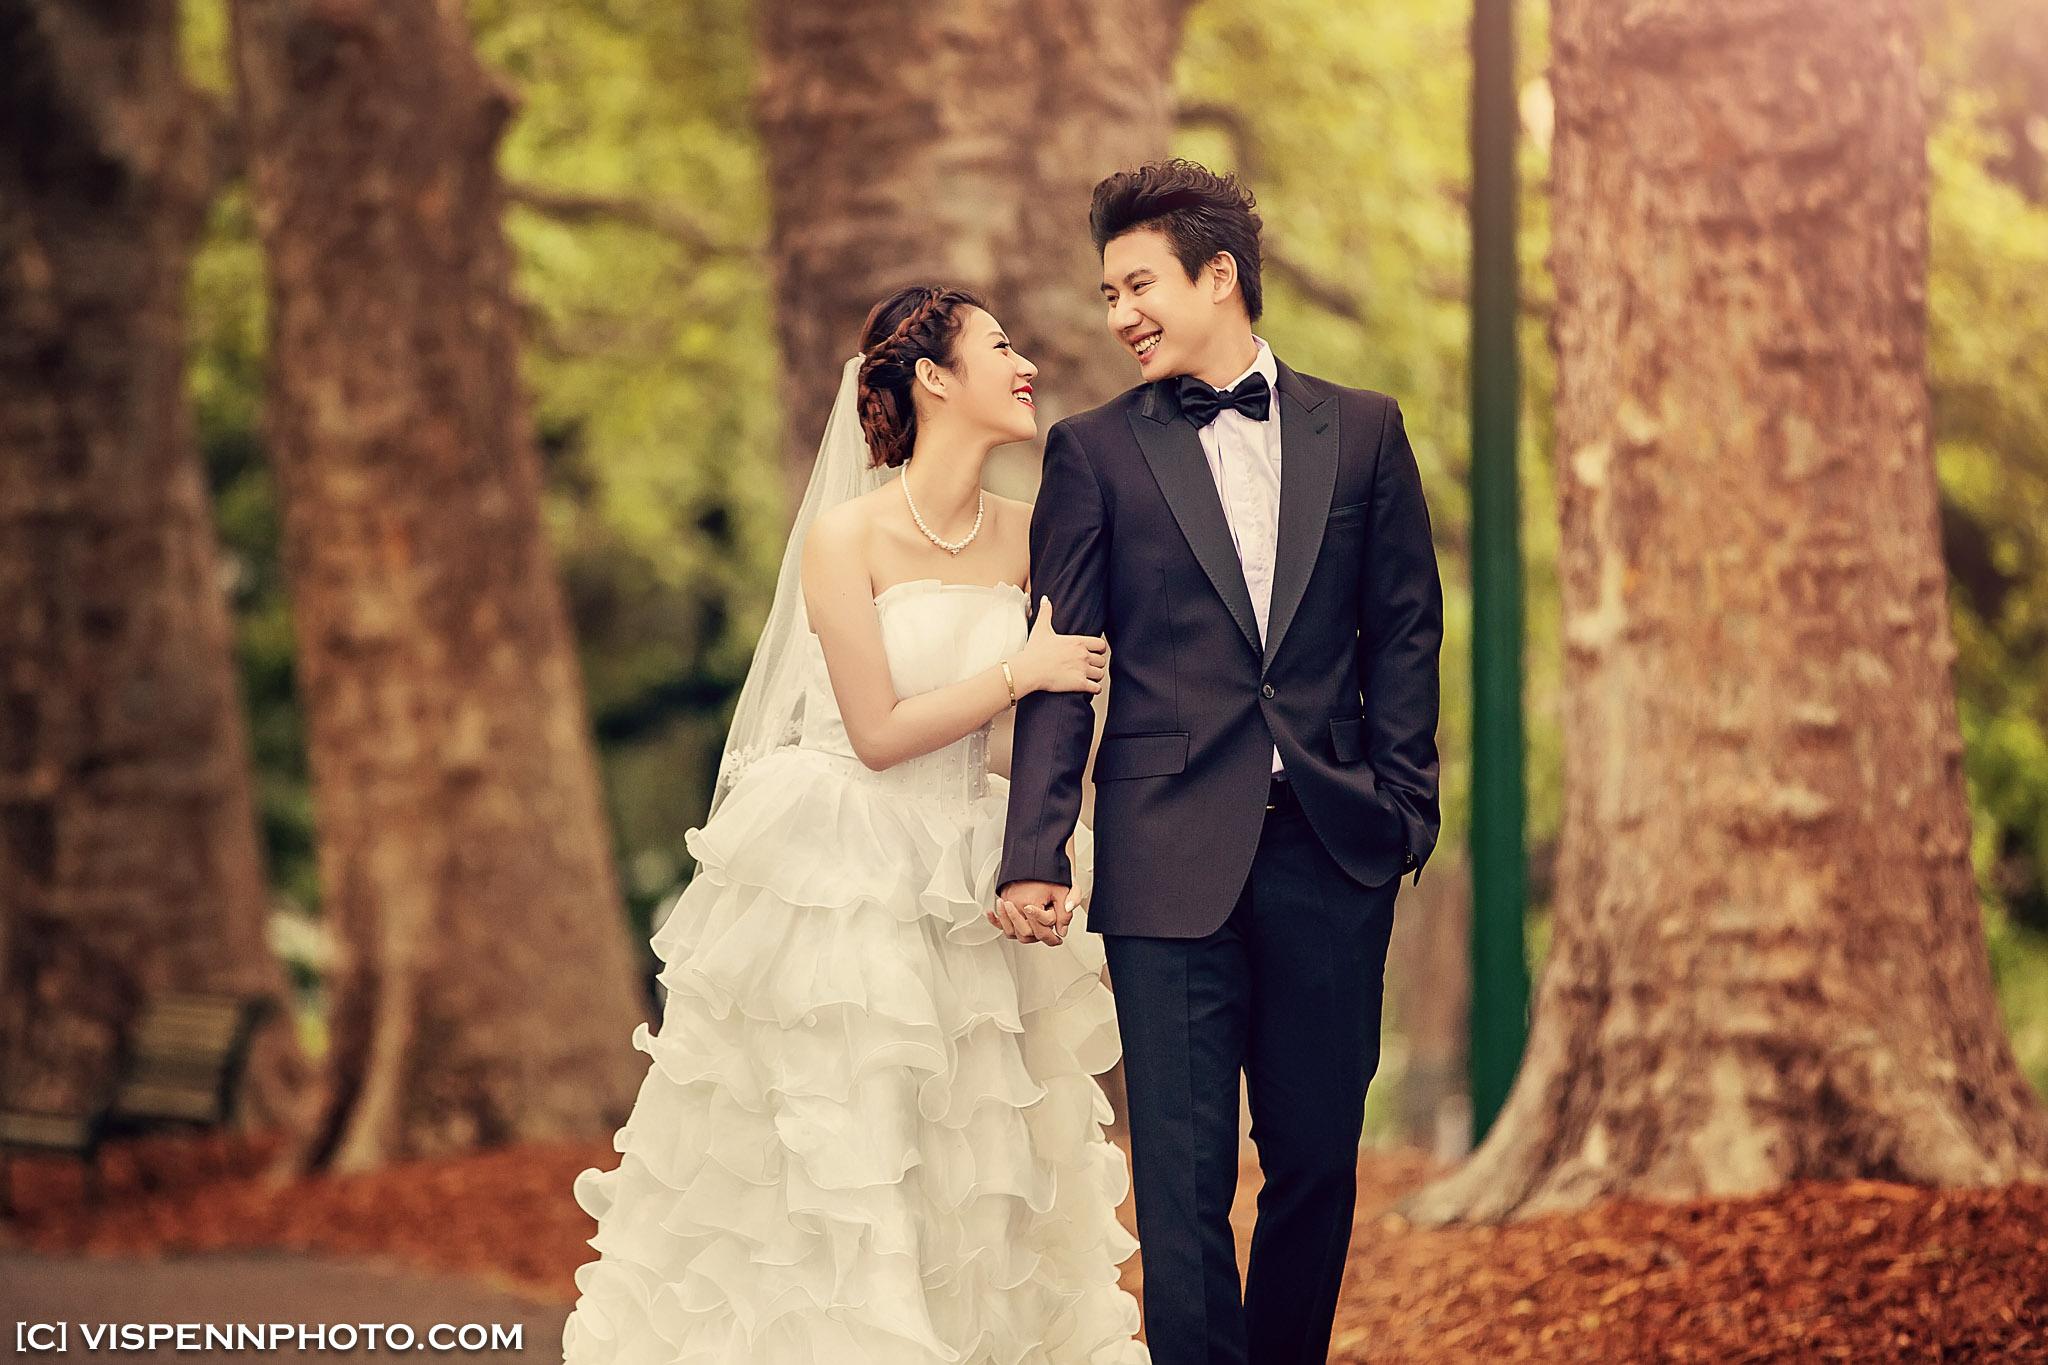 PRE WEDDING Photography Melbourne VISPENN 墨尔本 婚纱照 结婚照 婚纱摄影 5D3 3490